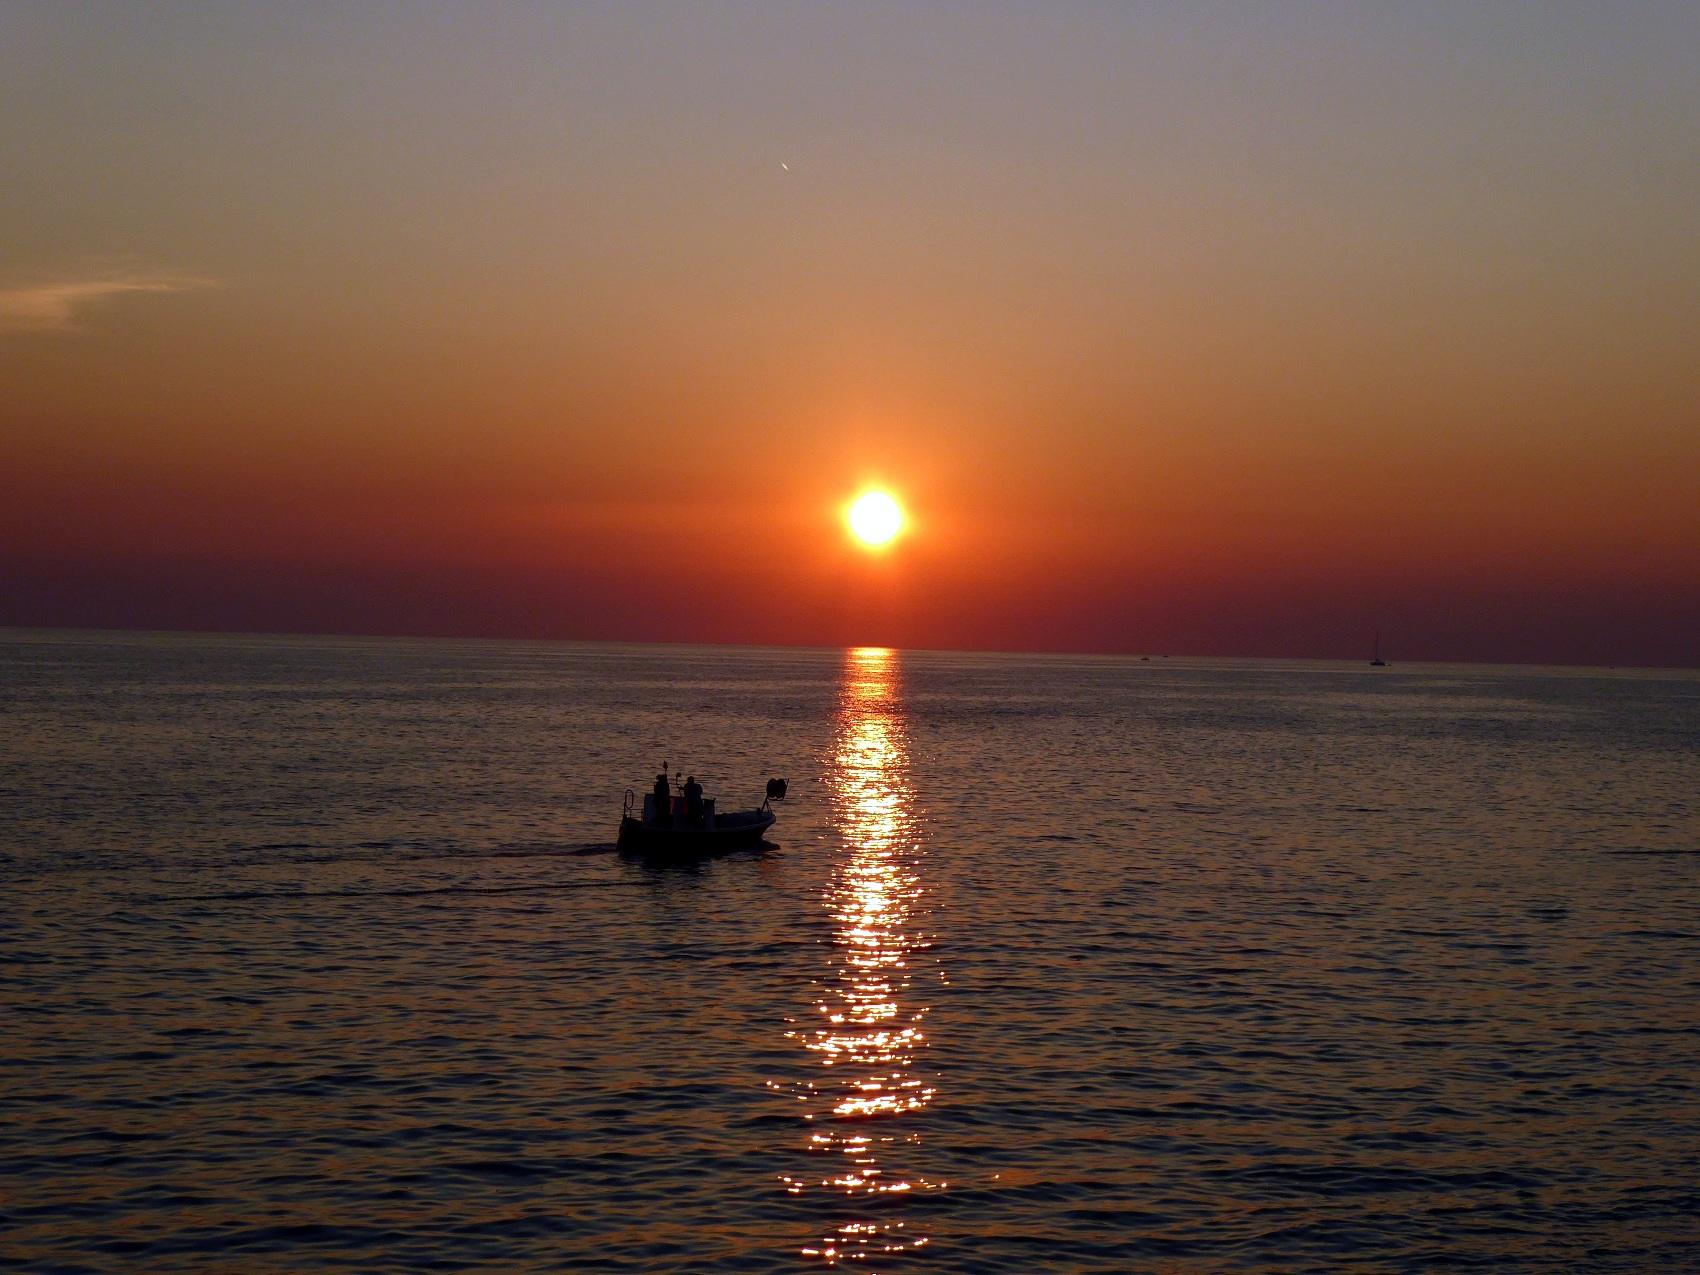 Sunset in Rovinj - Croatia